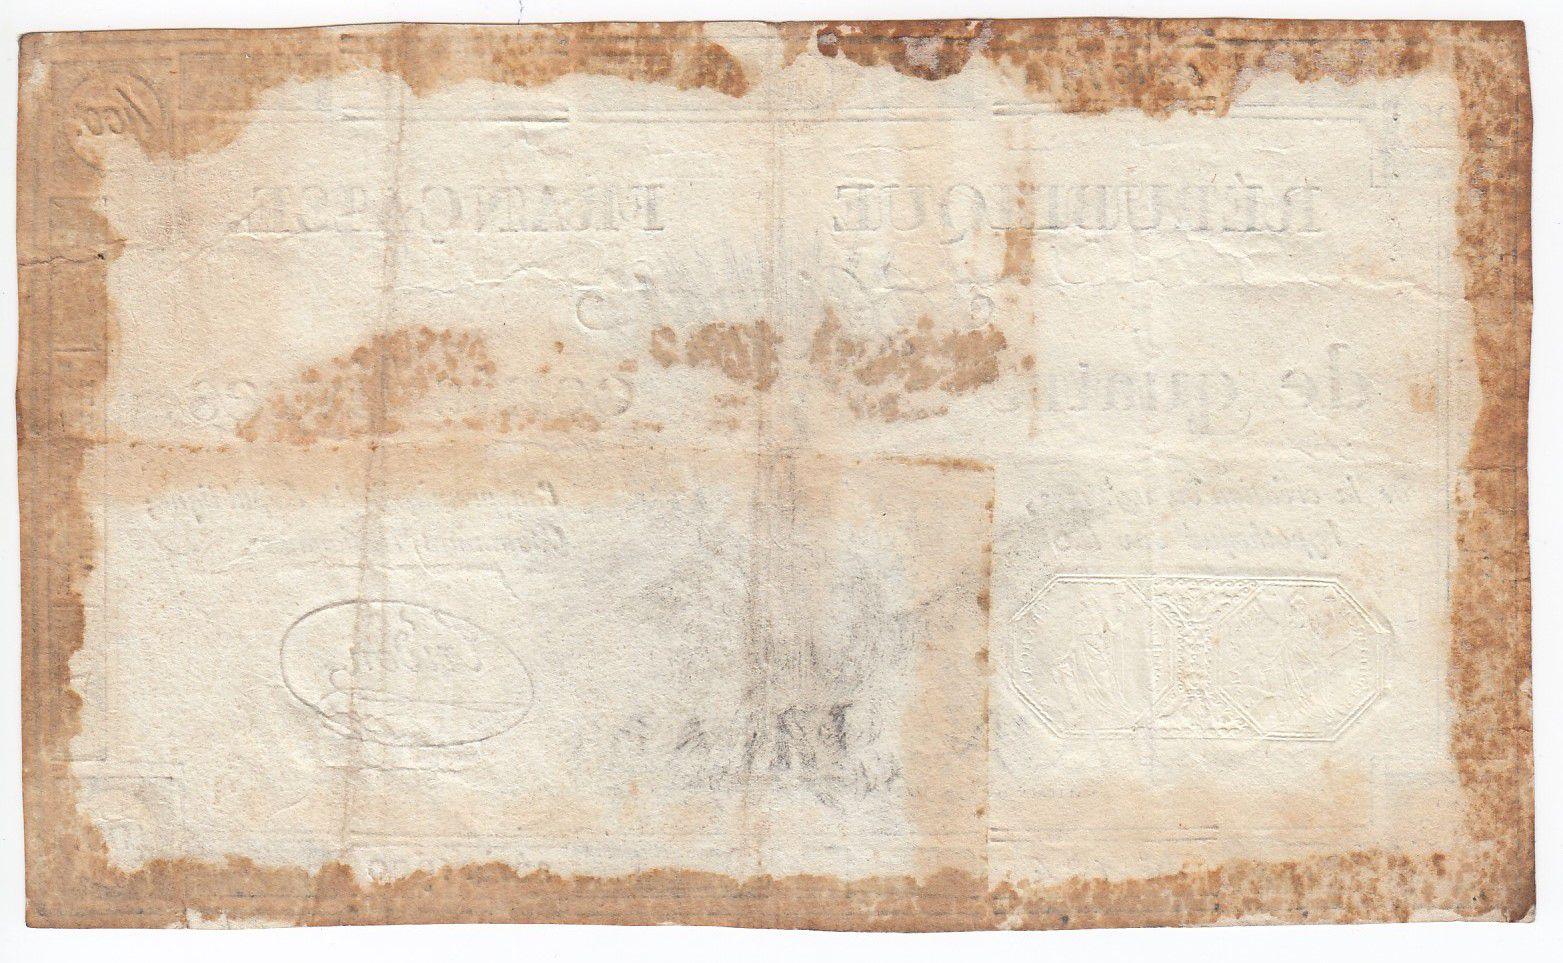 France 400 Livres 21-11-1792 - Sign. Tridon Série 1900 - TTB